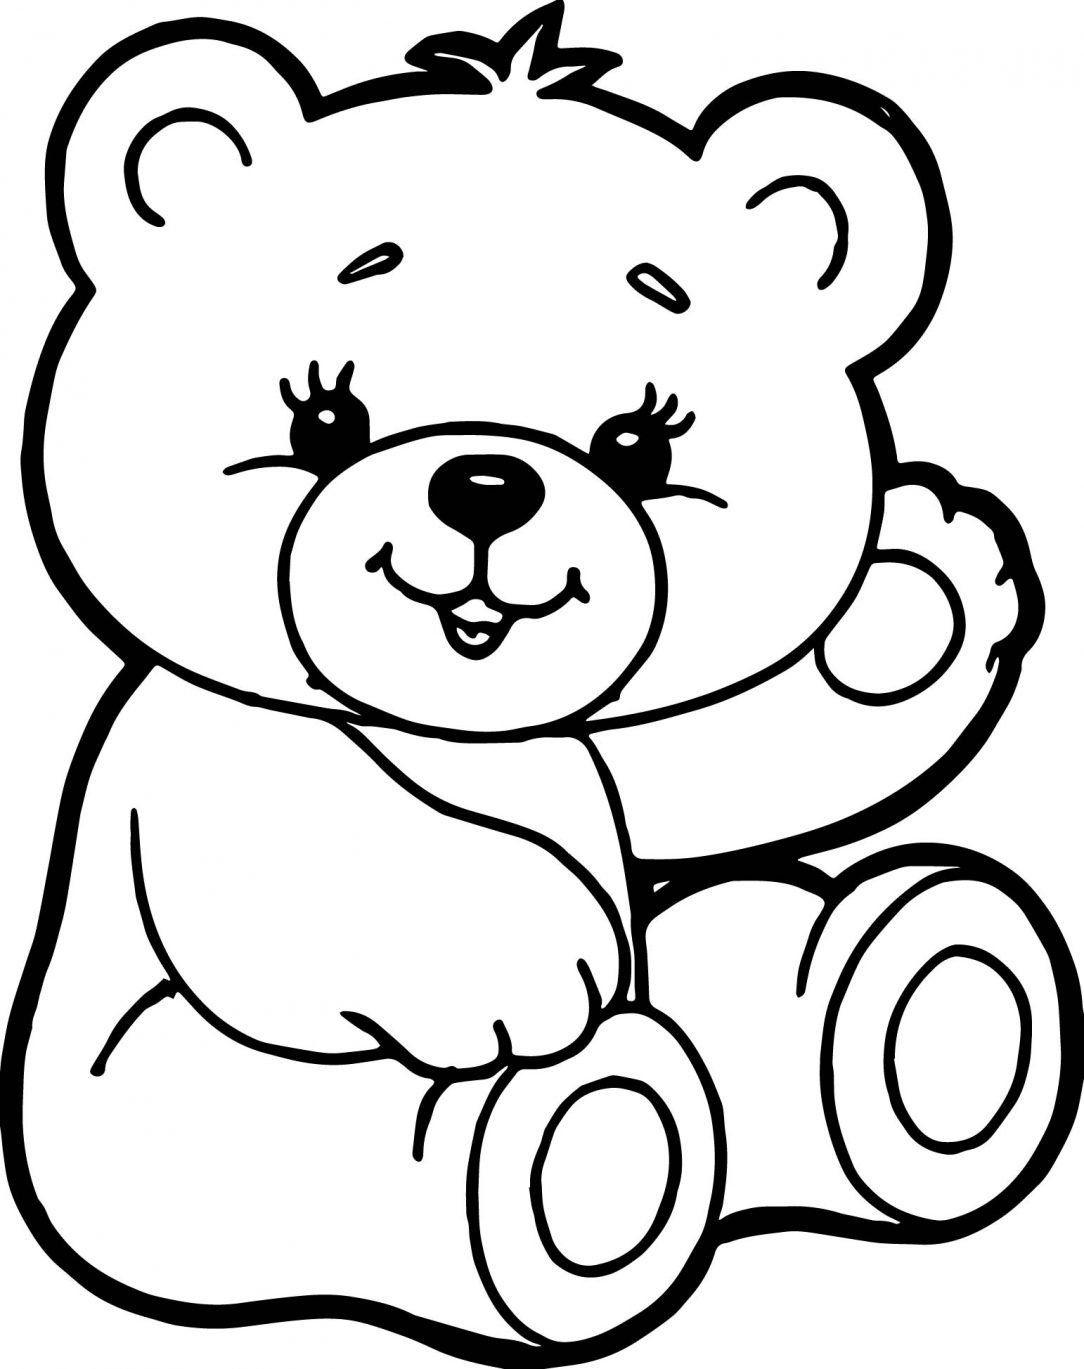 Teddy Bear Coloring Page Luxury Color Sheet Cute Teddy